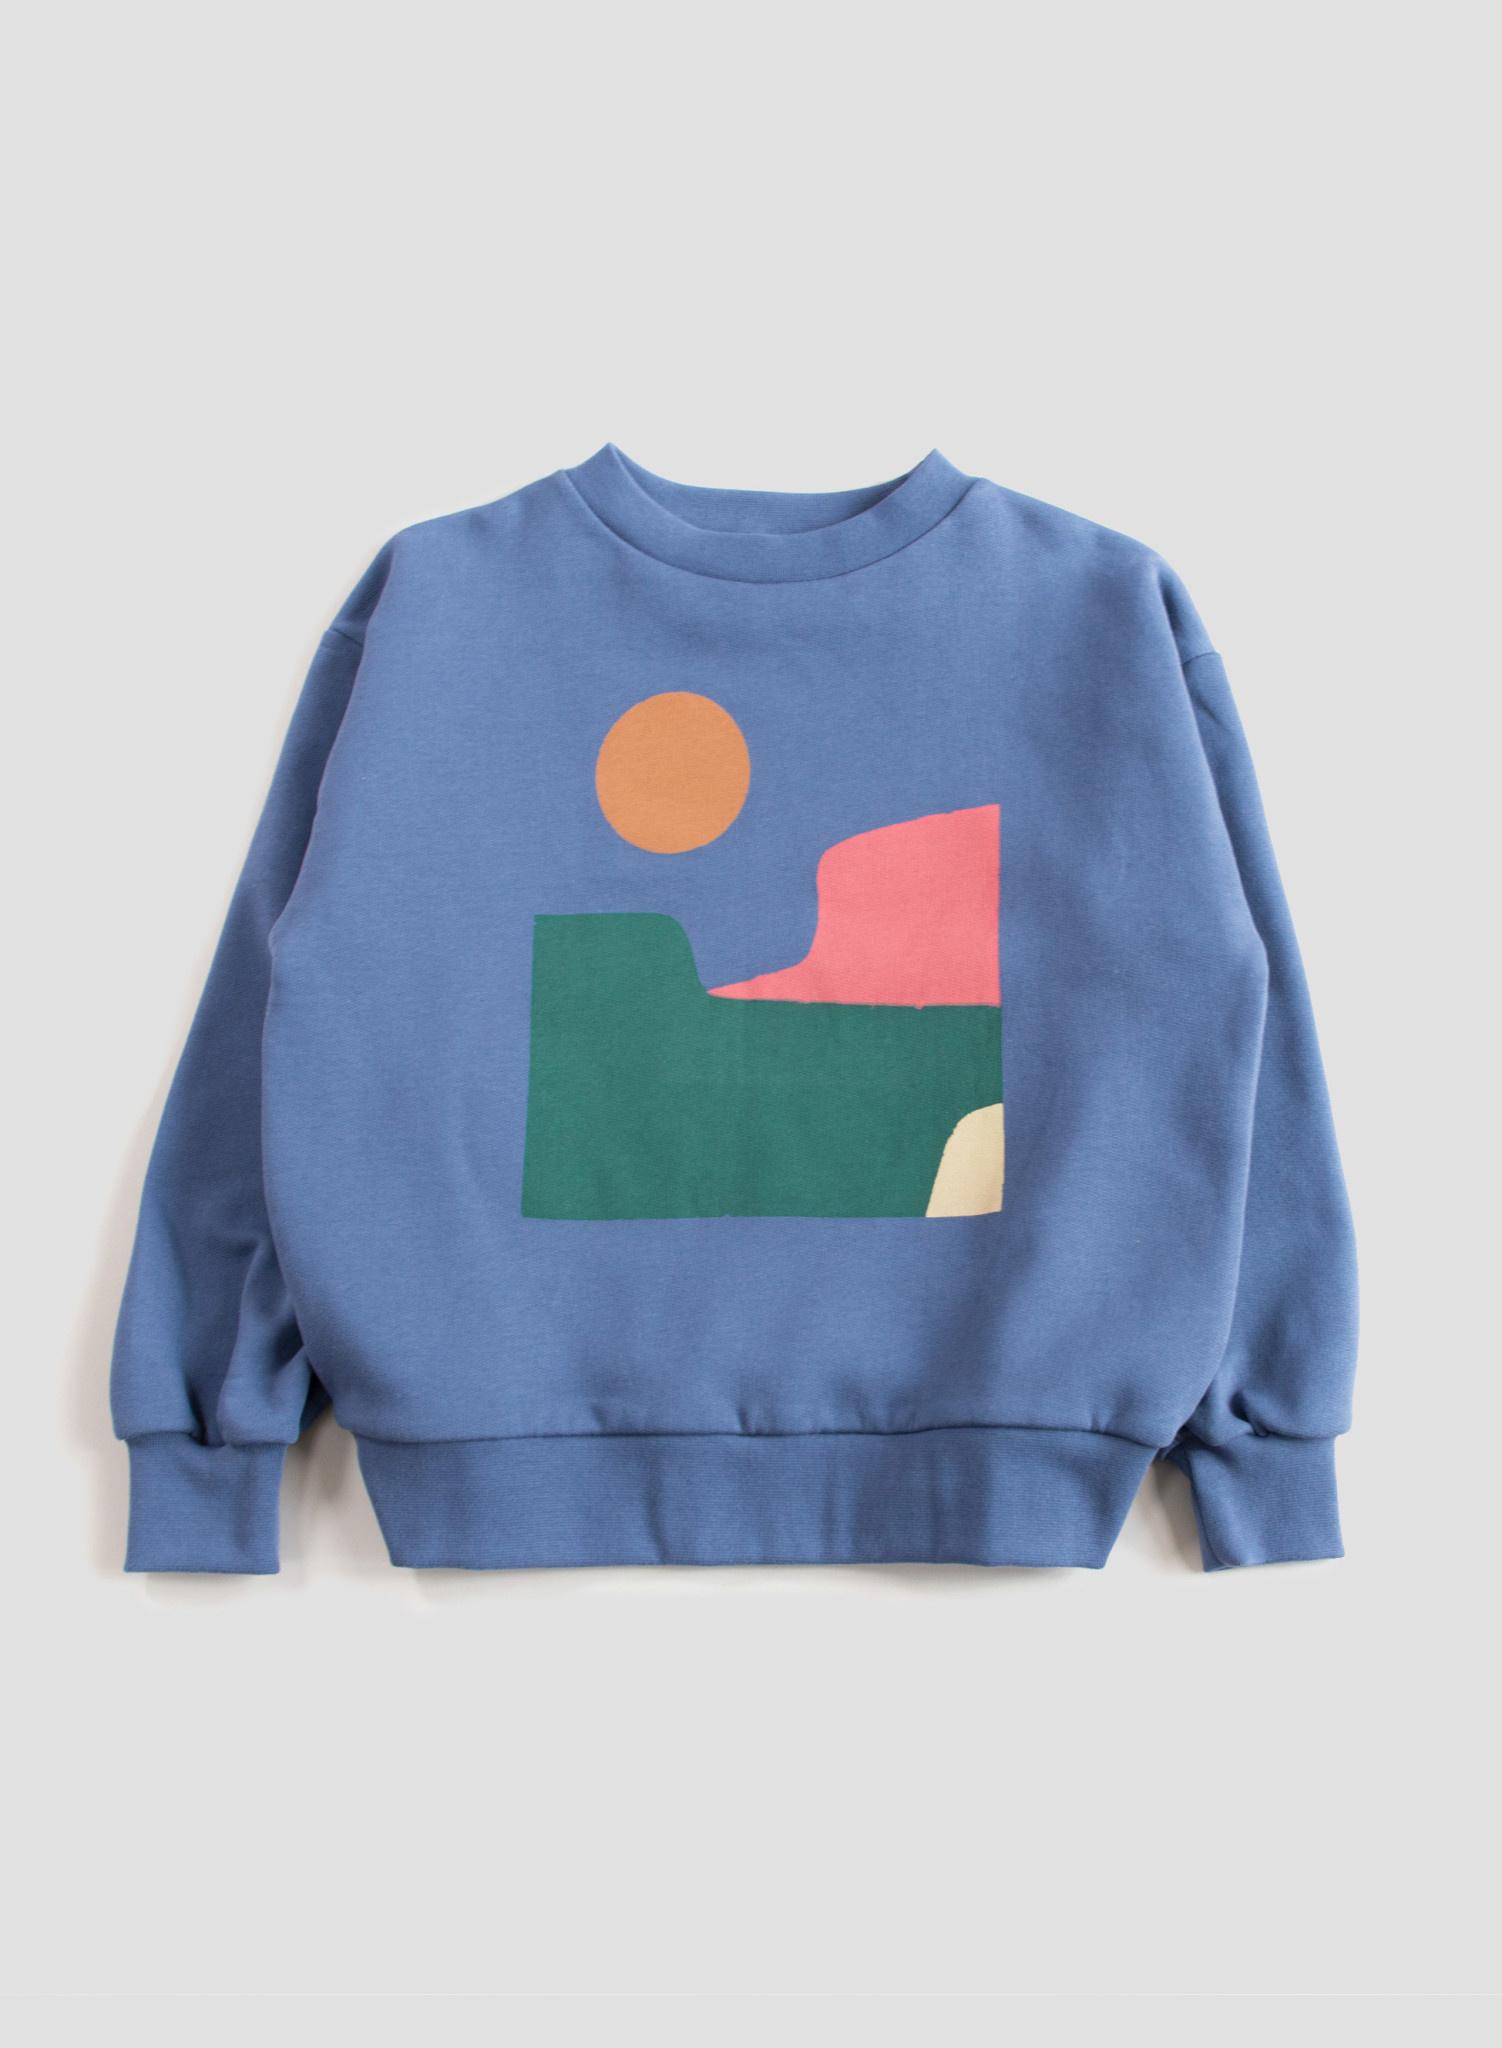 Balloon sweatshirt - Vintage Indigo Landscape-1